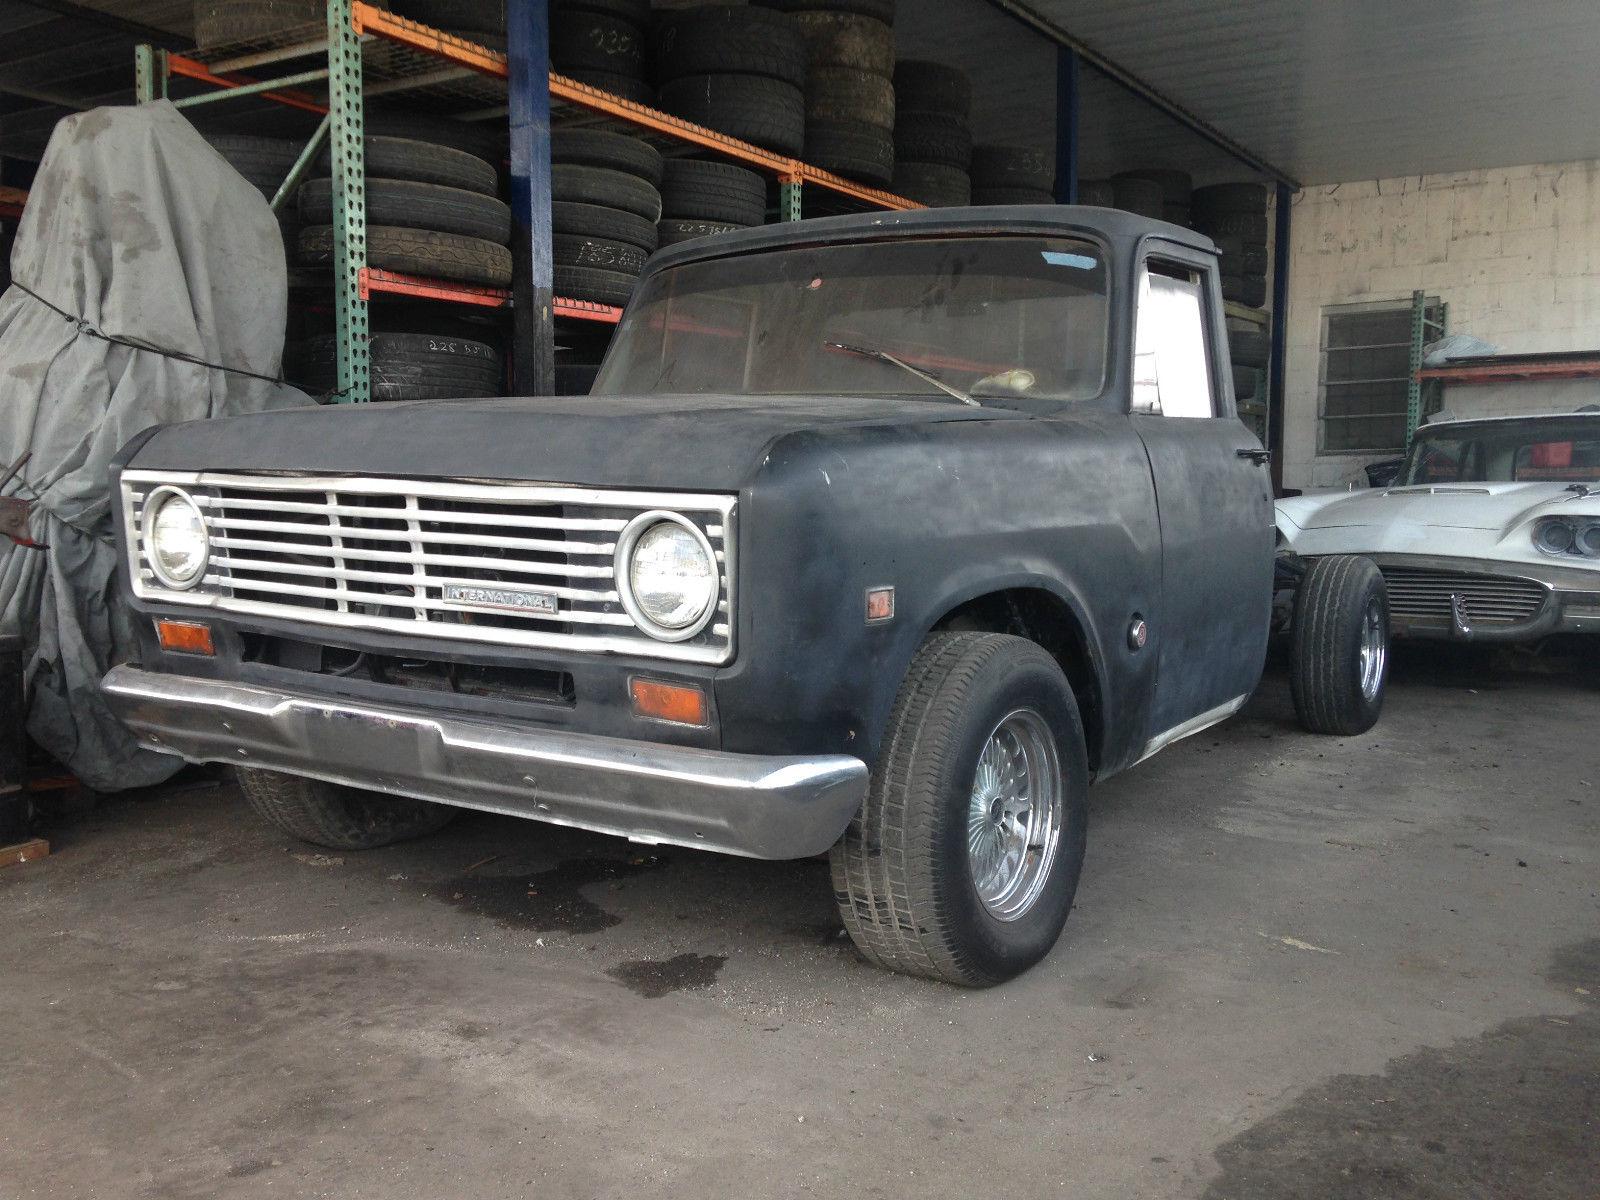 1975 International harvester pickup Chevy 305 engine truck